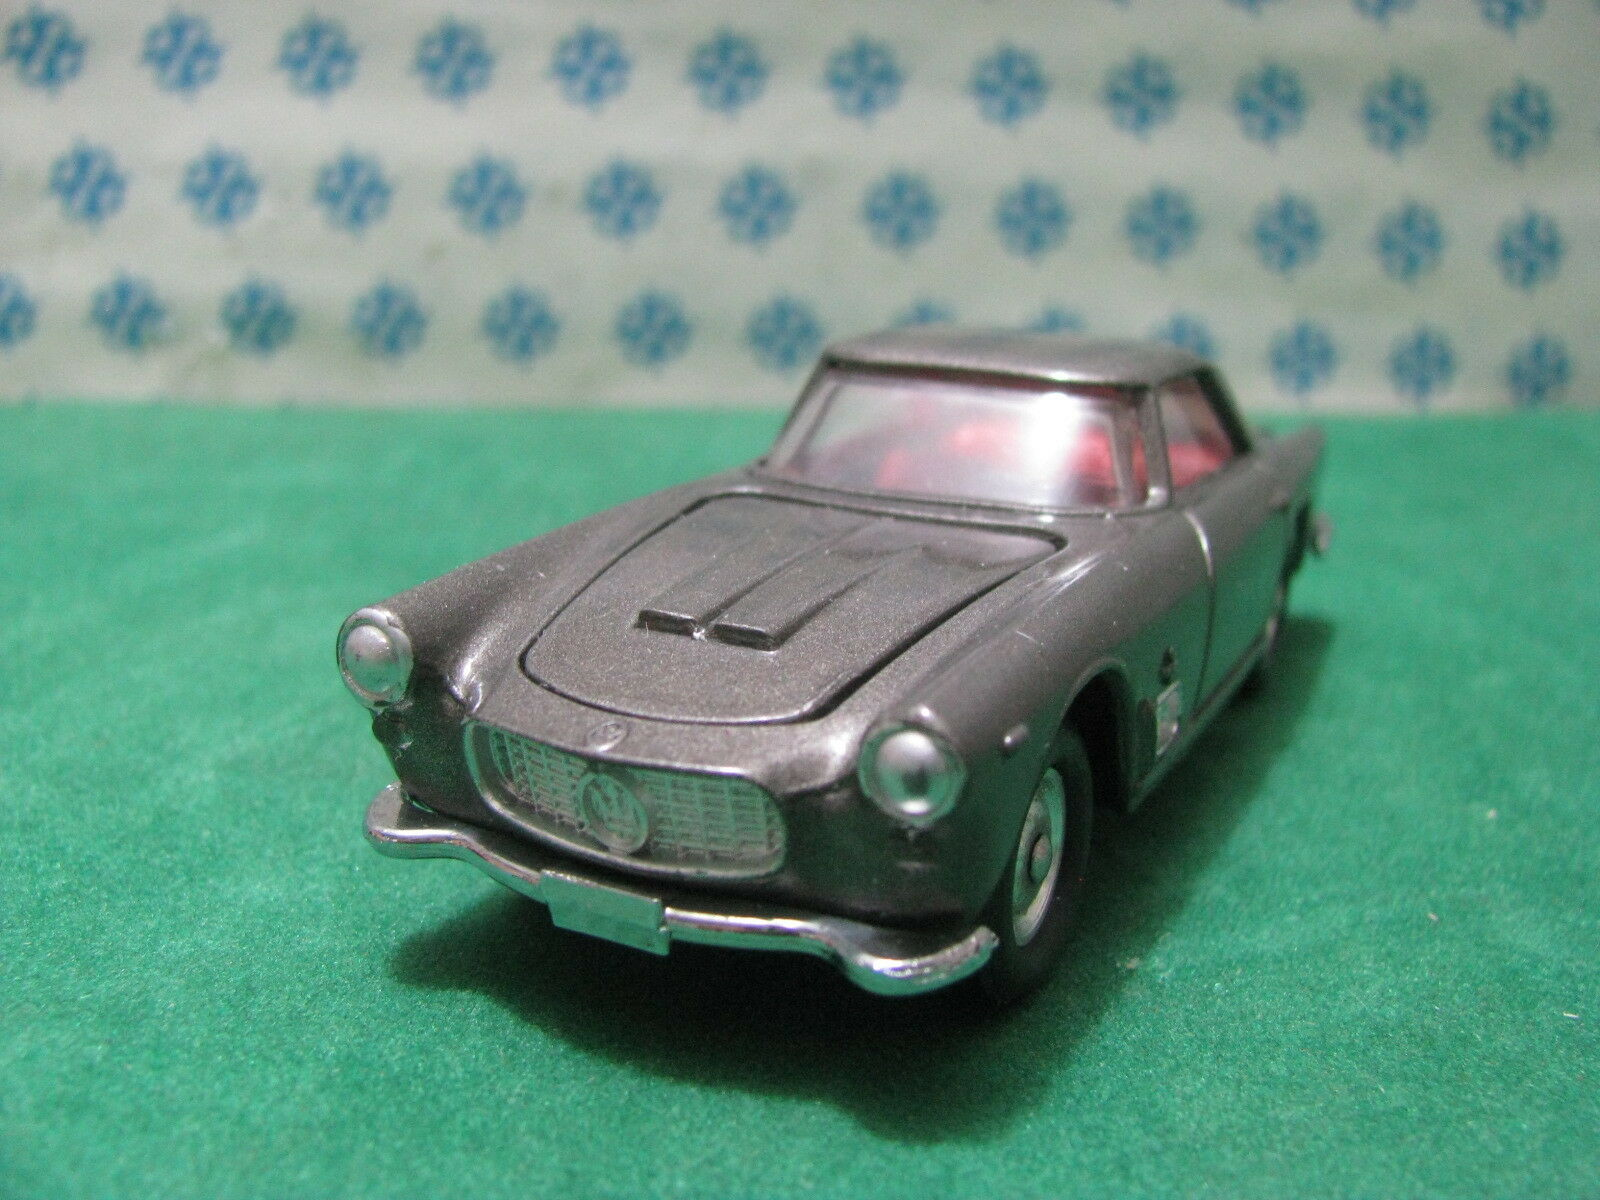 Vintage-Maserati 3500 Gran Turismo - 1 43 Mercury Art. 24 NEW